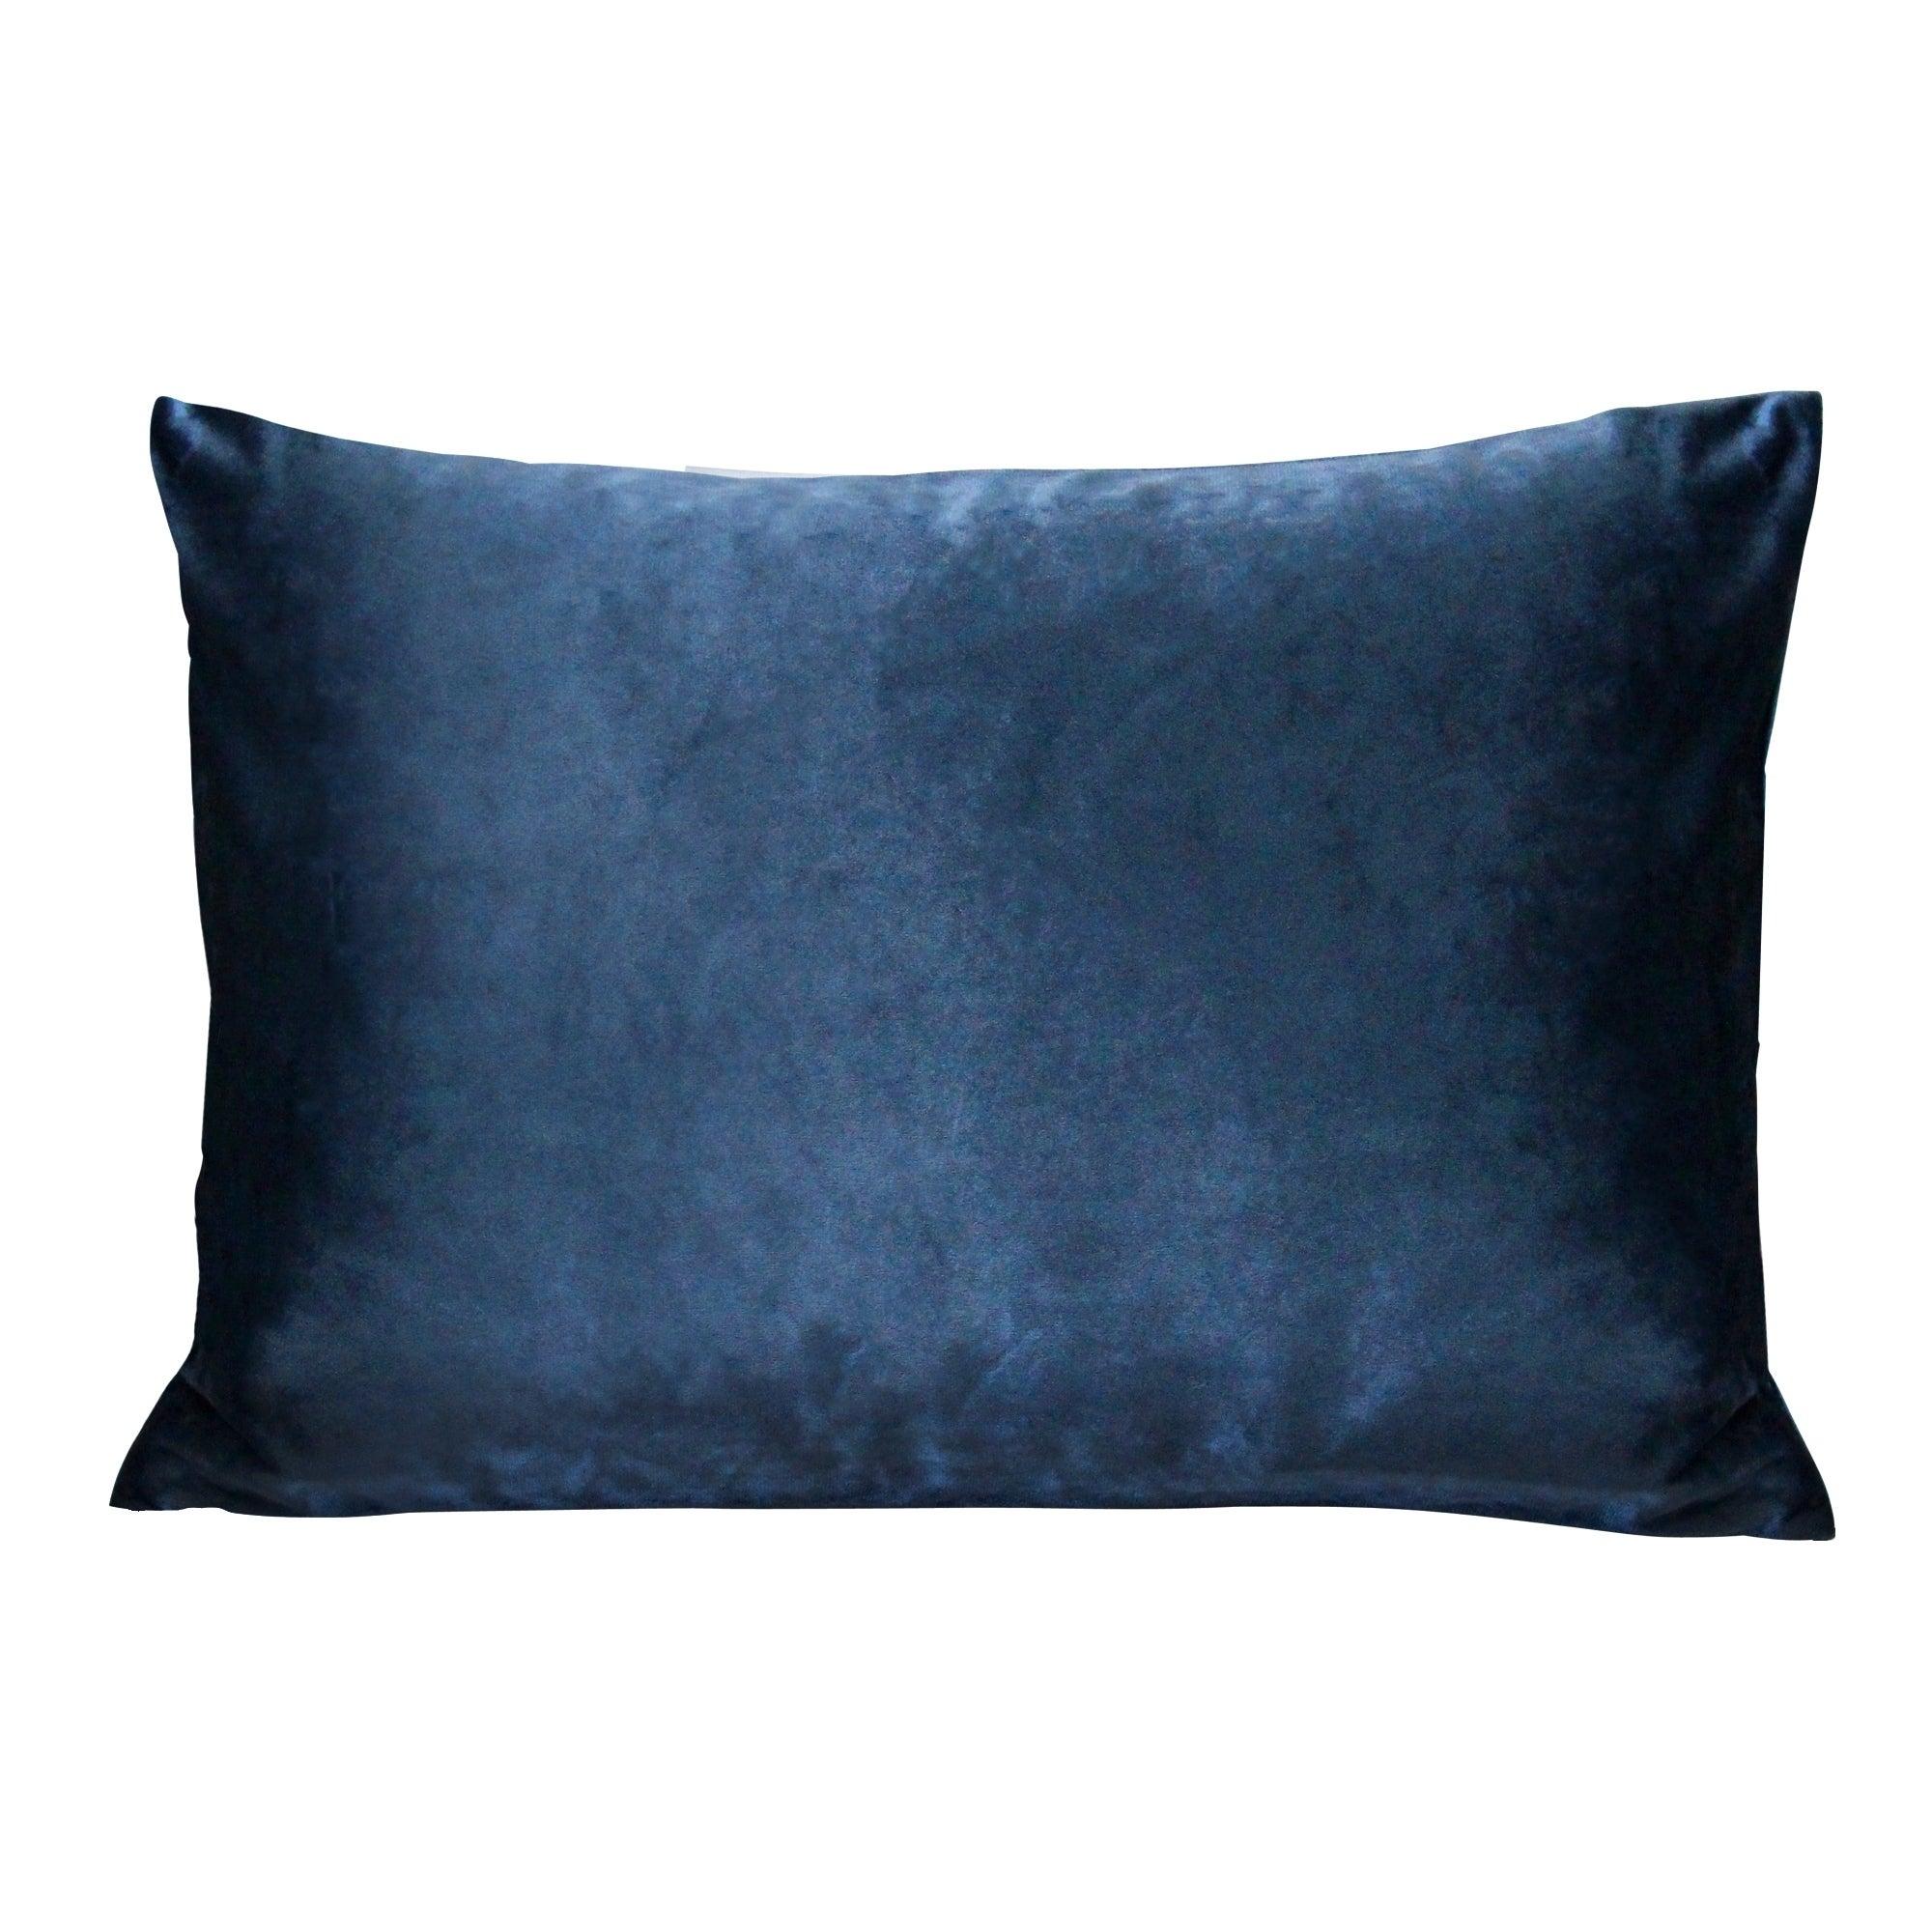 Stratton Home Decor Royal Blue Velvet Lumbar Pillow On Sale Overstock 30091606